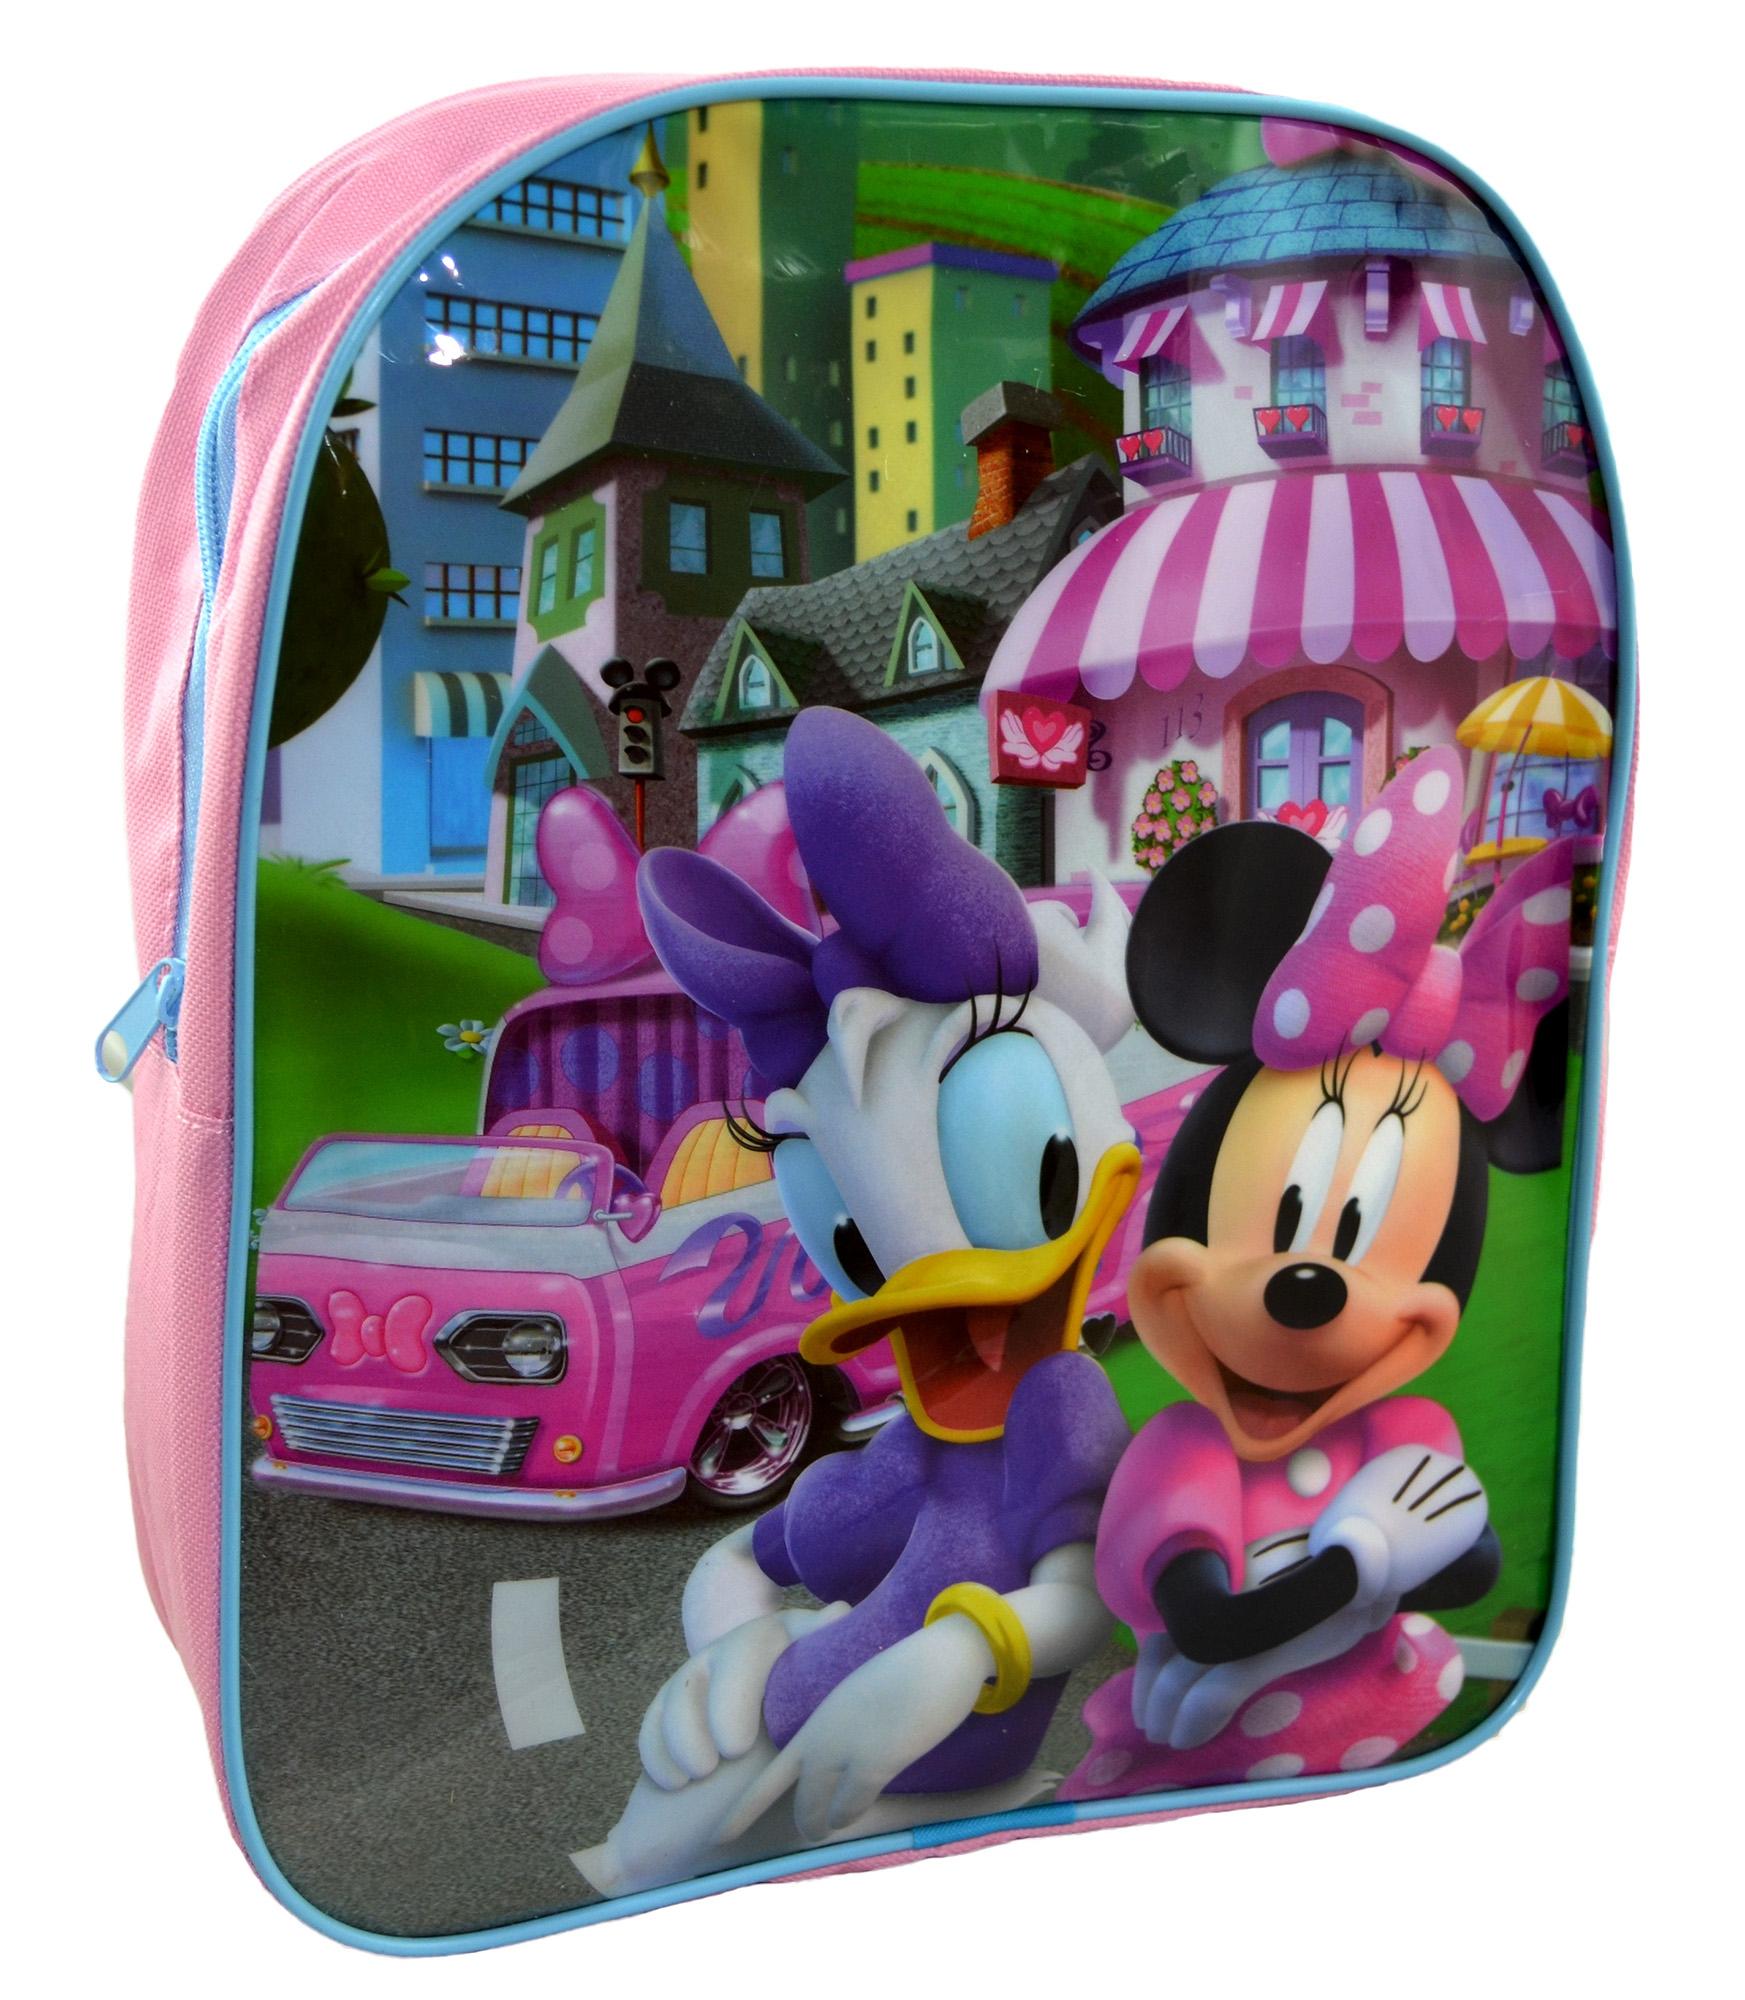 Disney Minnie Mouse 'Friends' Junior School Bag Rucksack Backpack